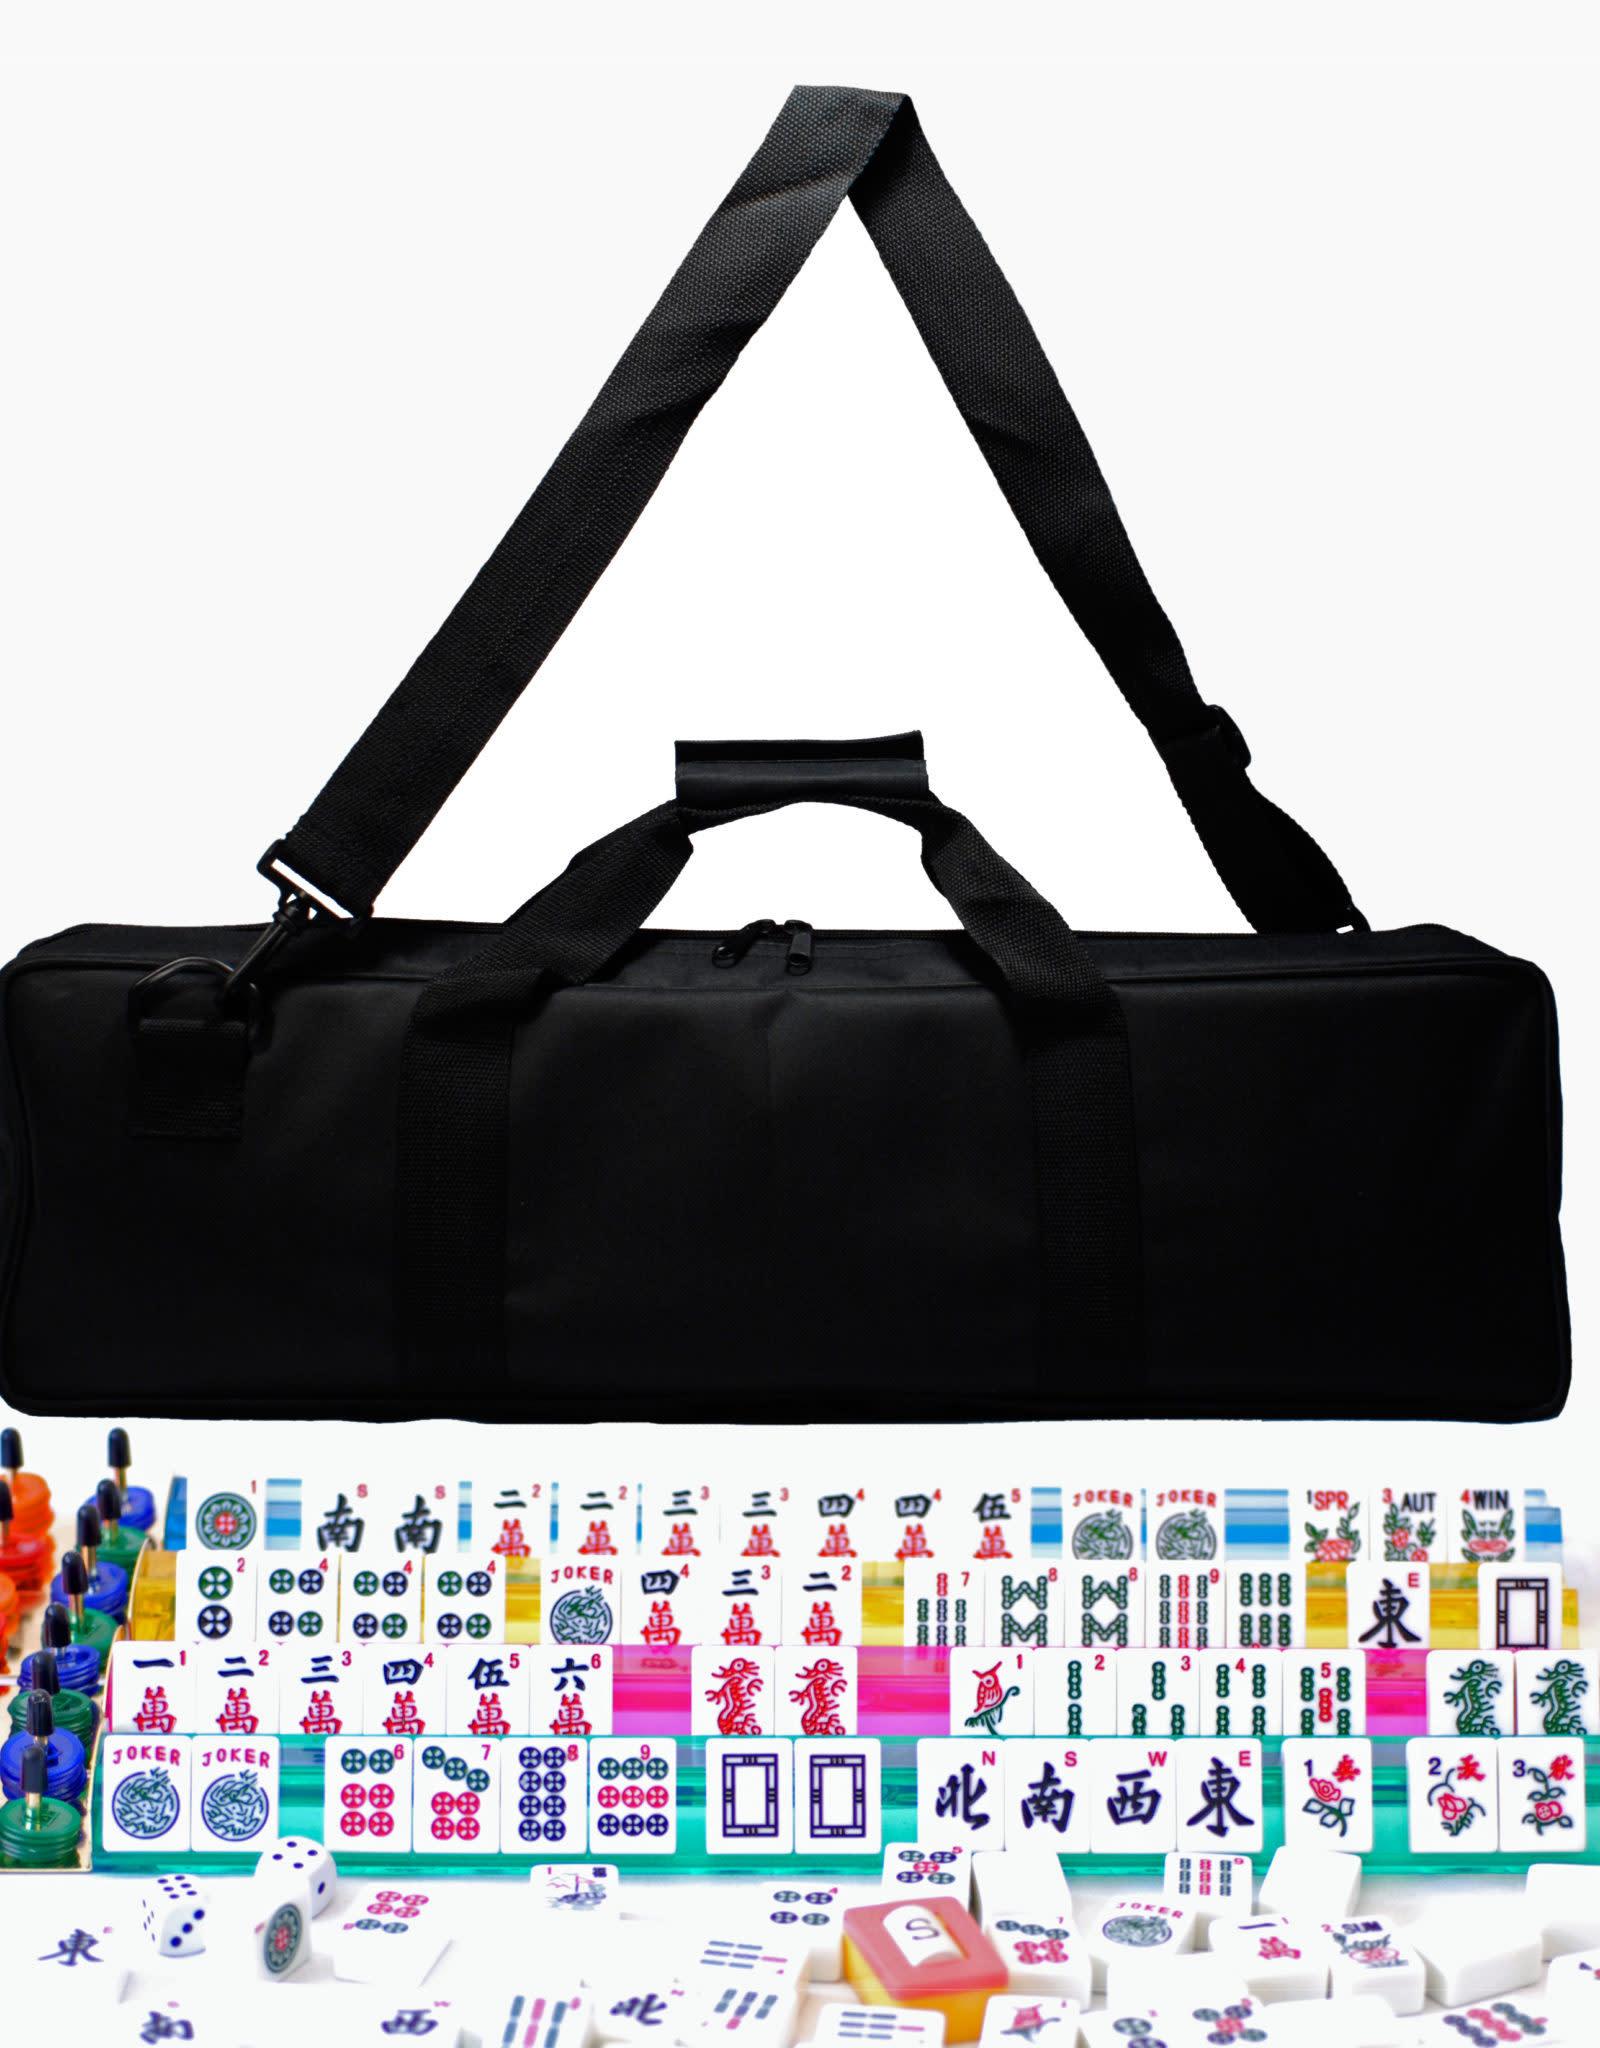 American Mahjong in Canvas Bag